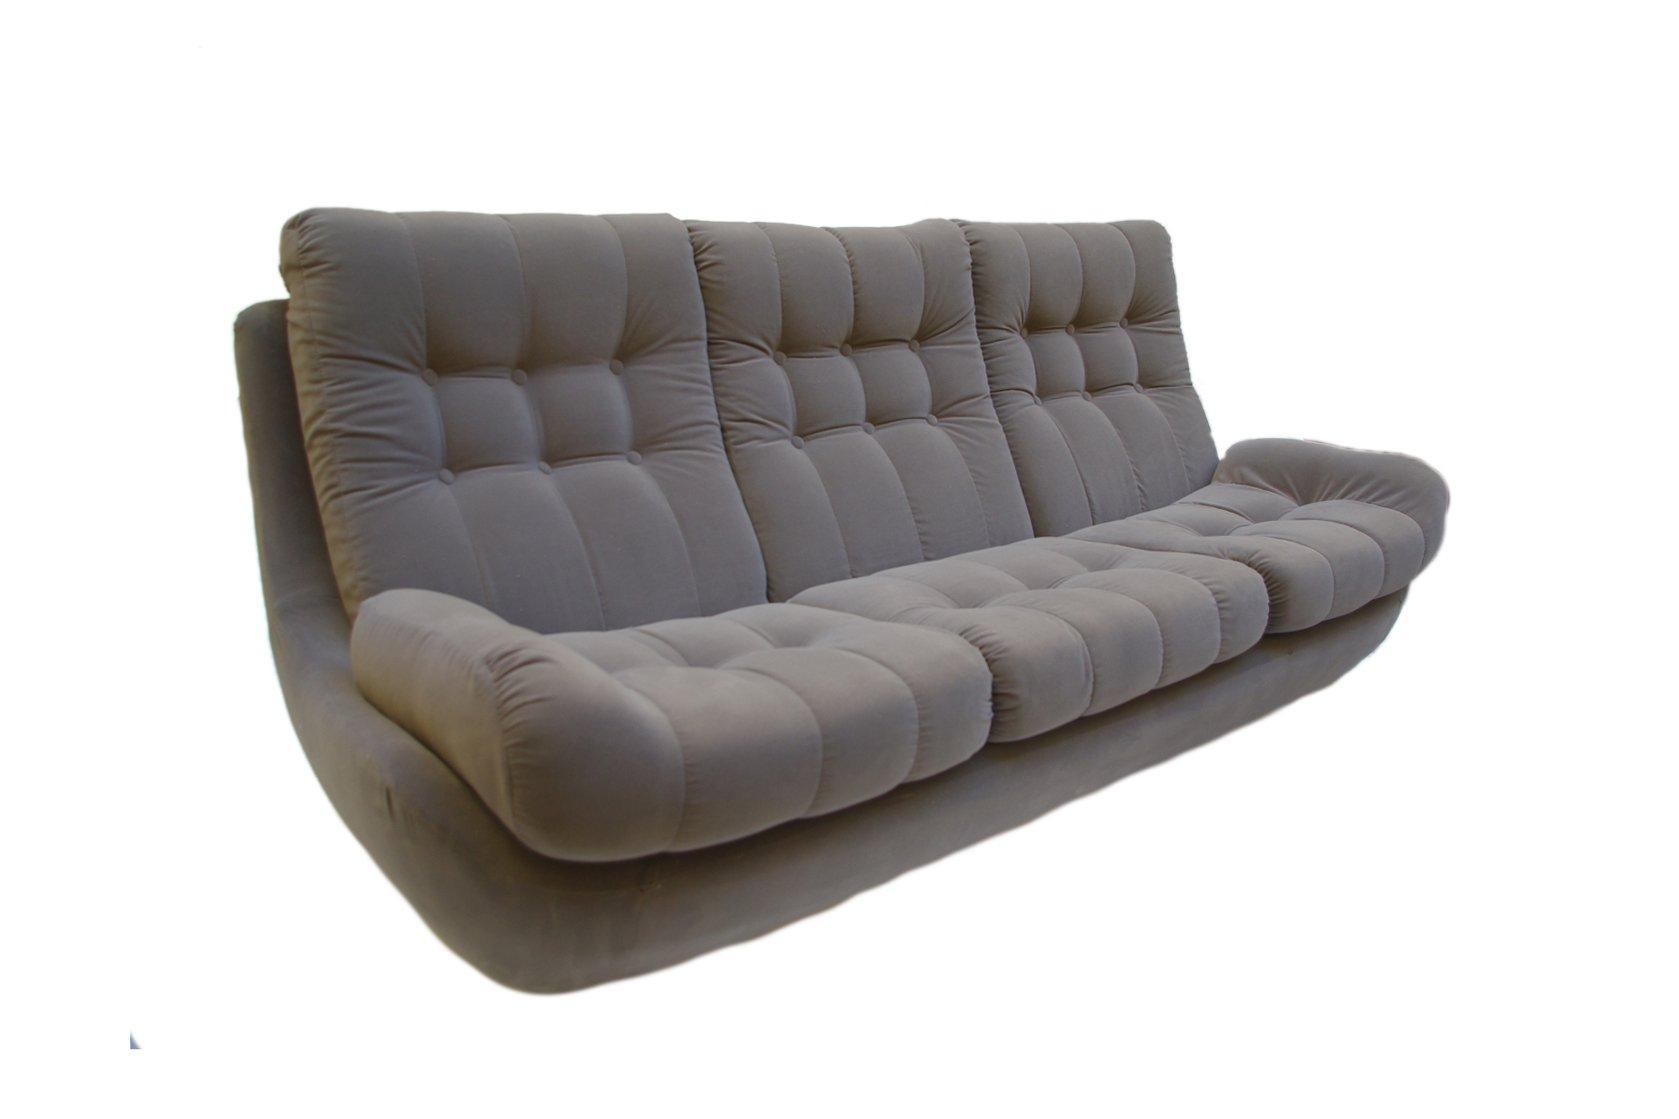 Vintage Velvet Sofa 1970s For Sale At Pamono